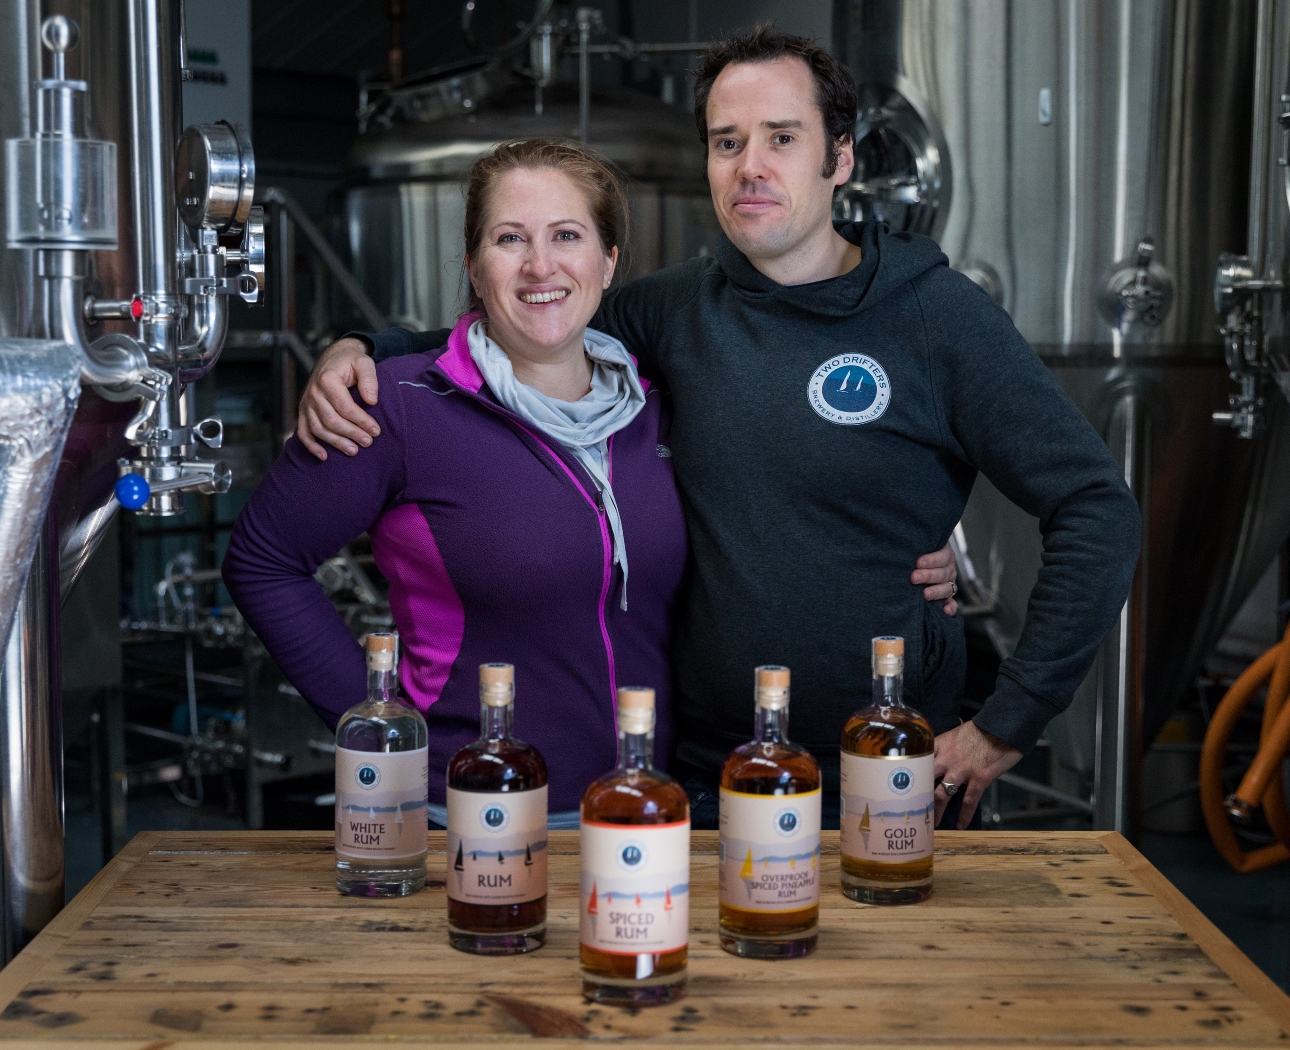 Devon-Based carbon negative rum distillery Two Drifters reach crowdfunding target